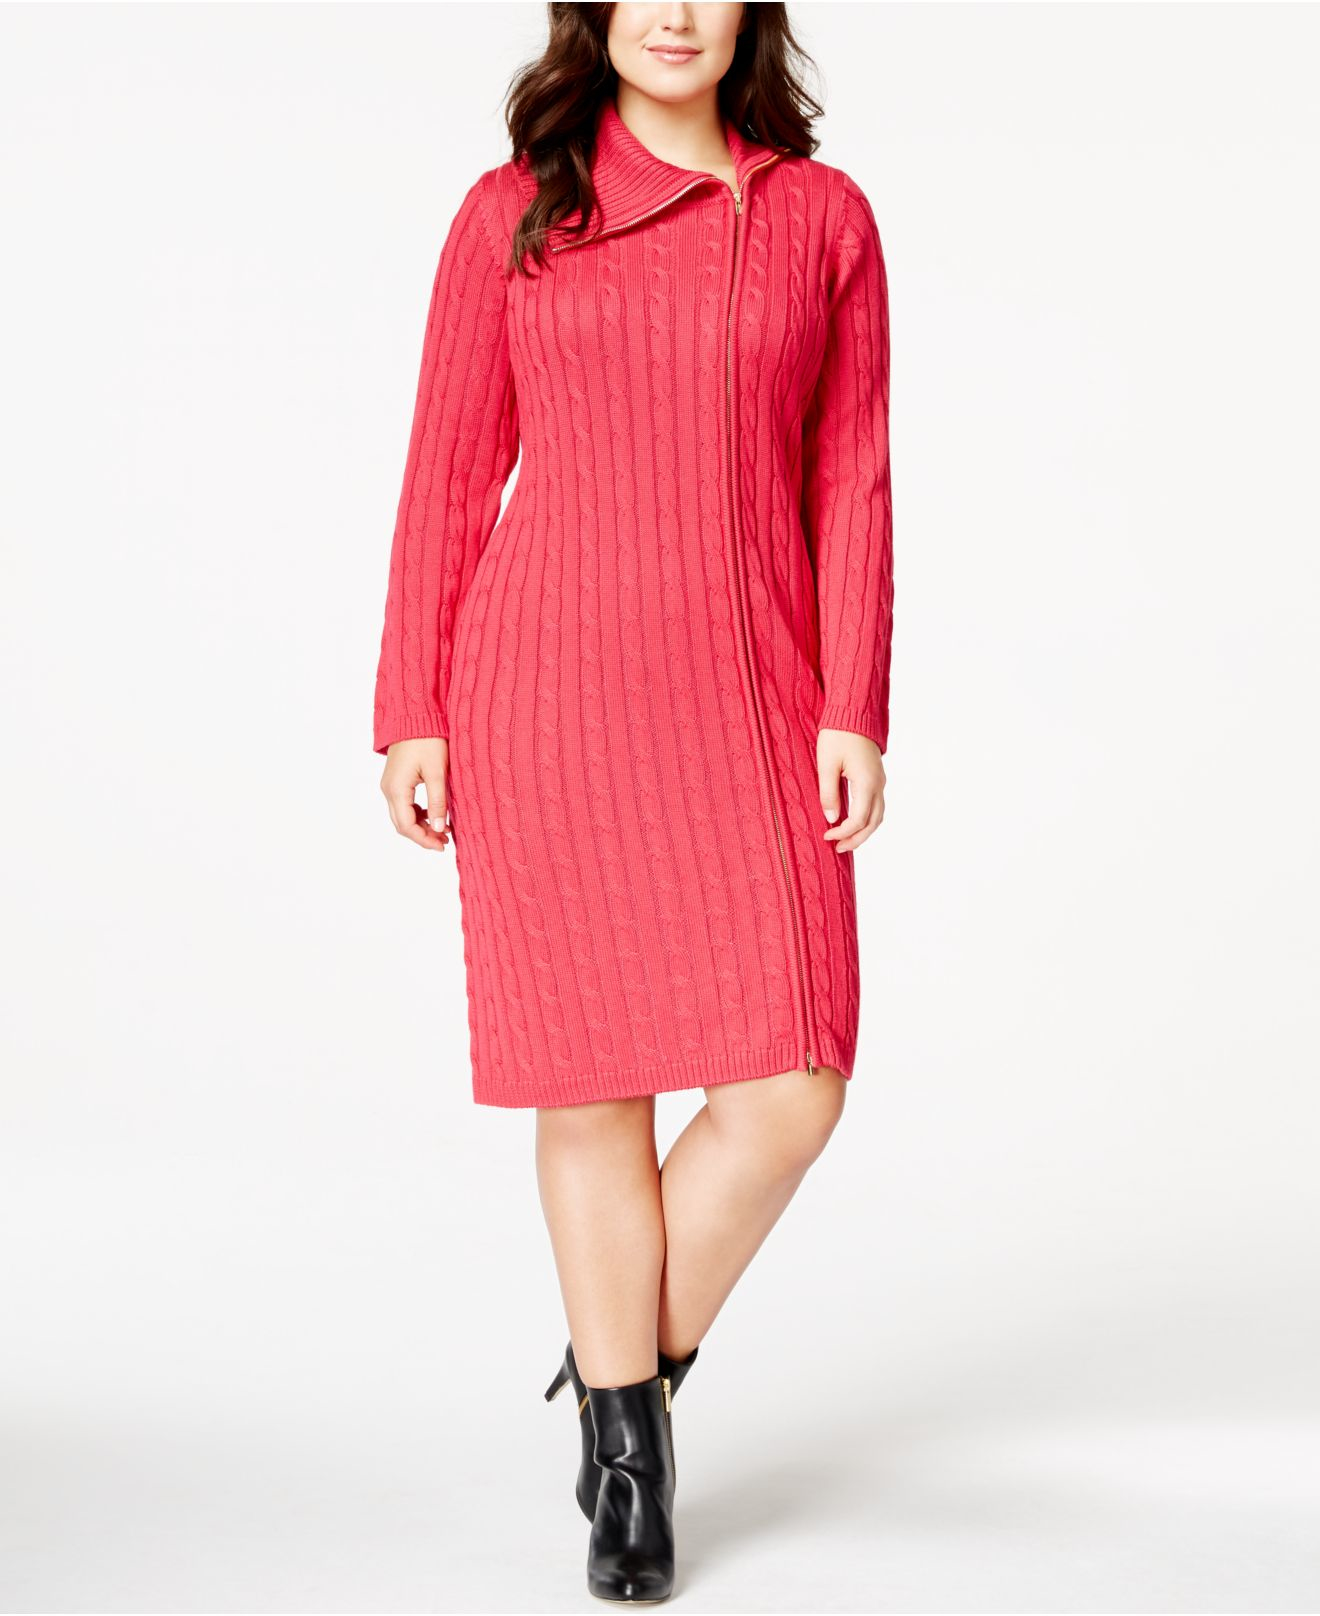 macys knit dresses photo - 1